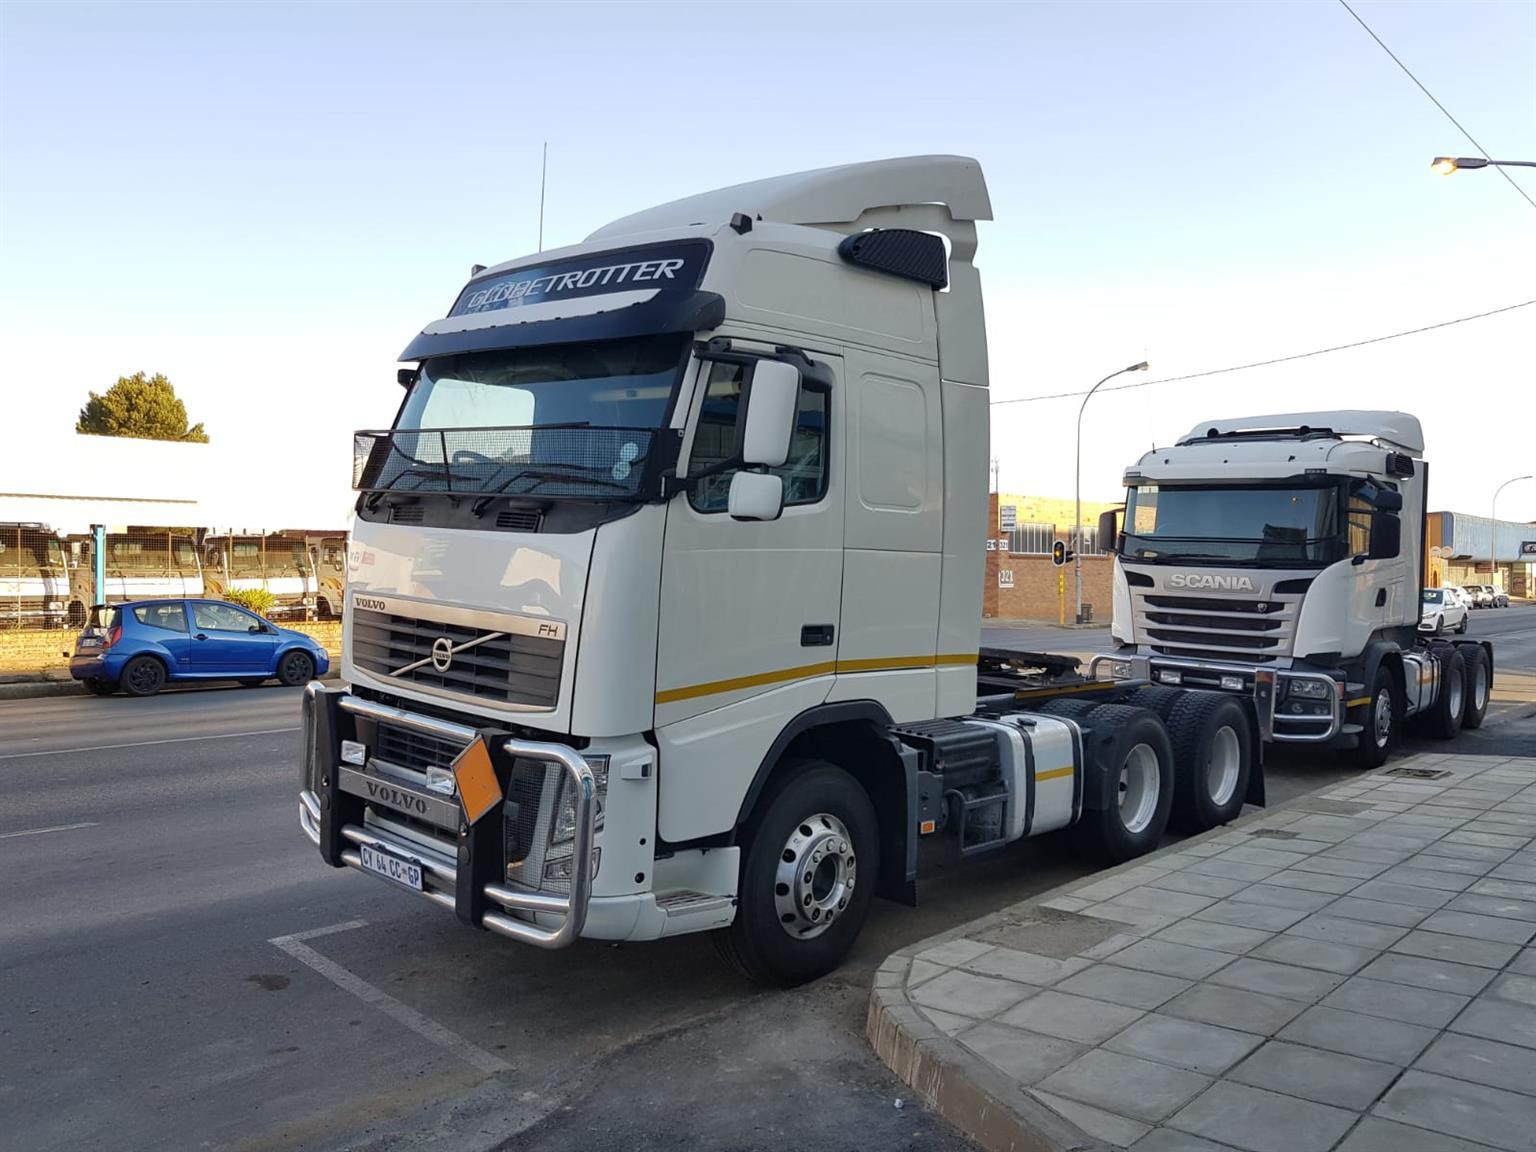 Globtrotter Volvo selling now